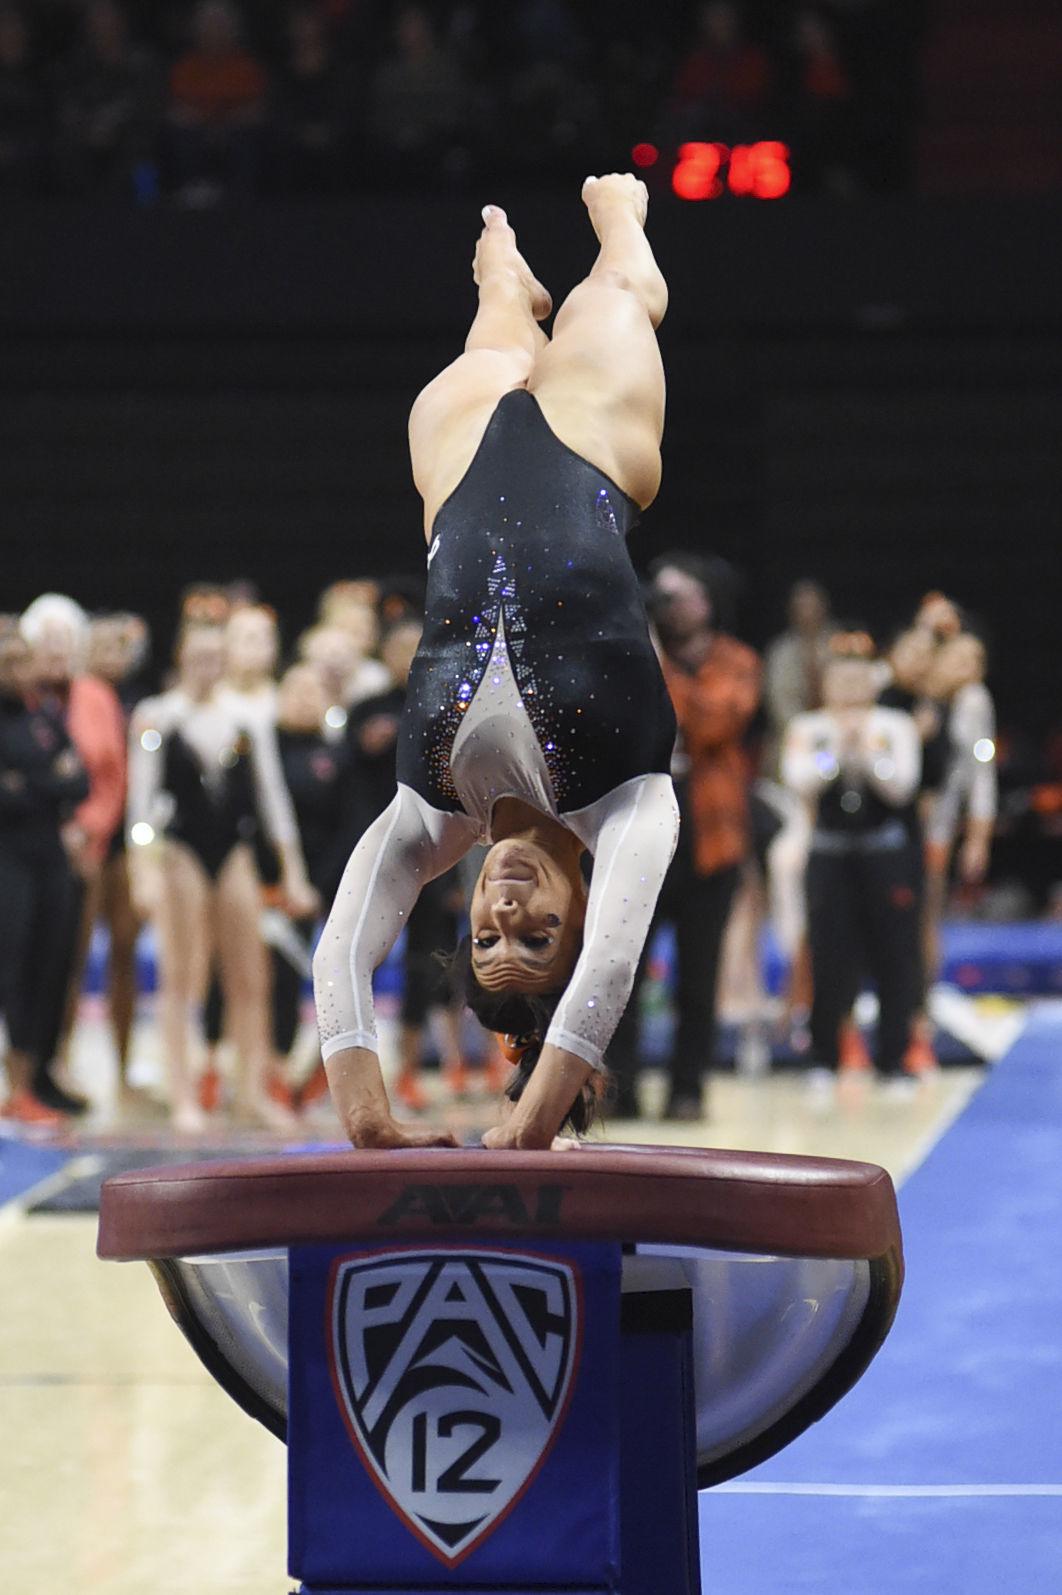 OSU gymnastics: Kaitlyn Yanish has polished her landing